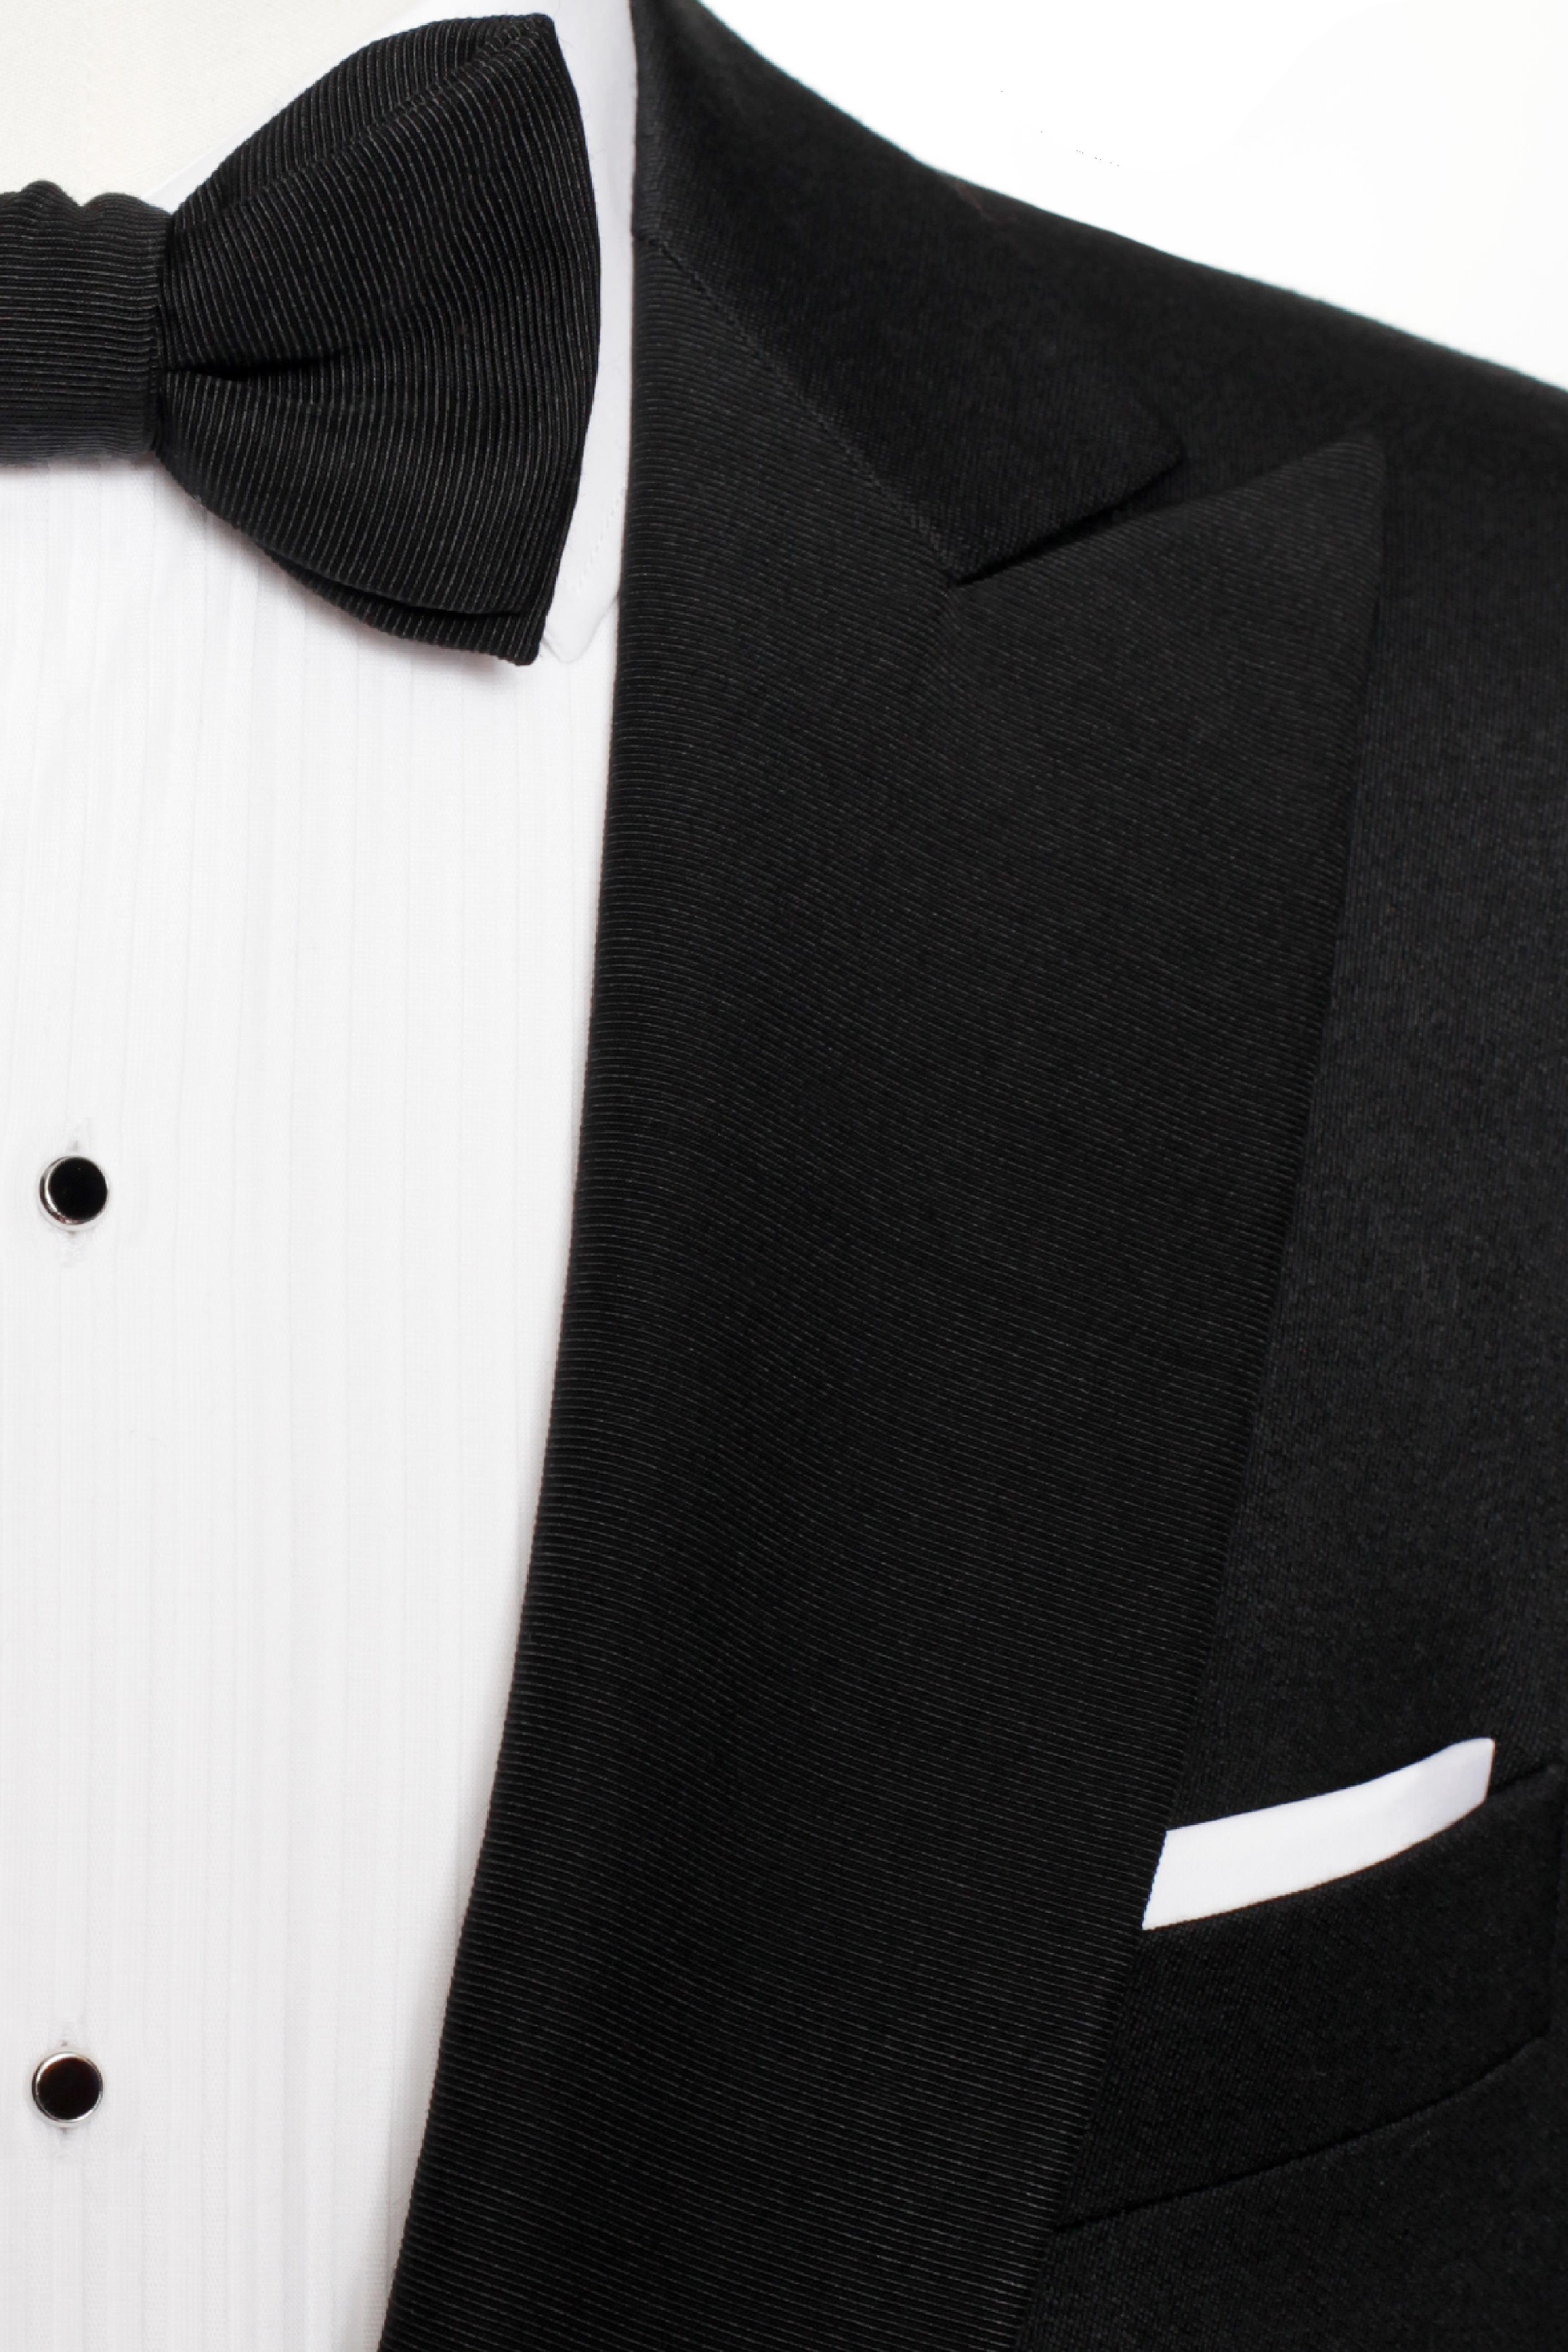 Smoking et queue de pie sur mesure c remonie et mariage - Dessin costume ...